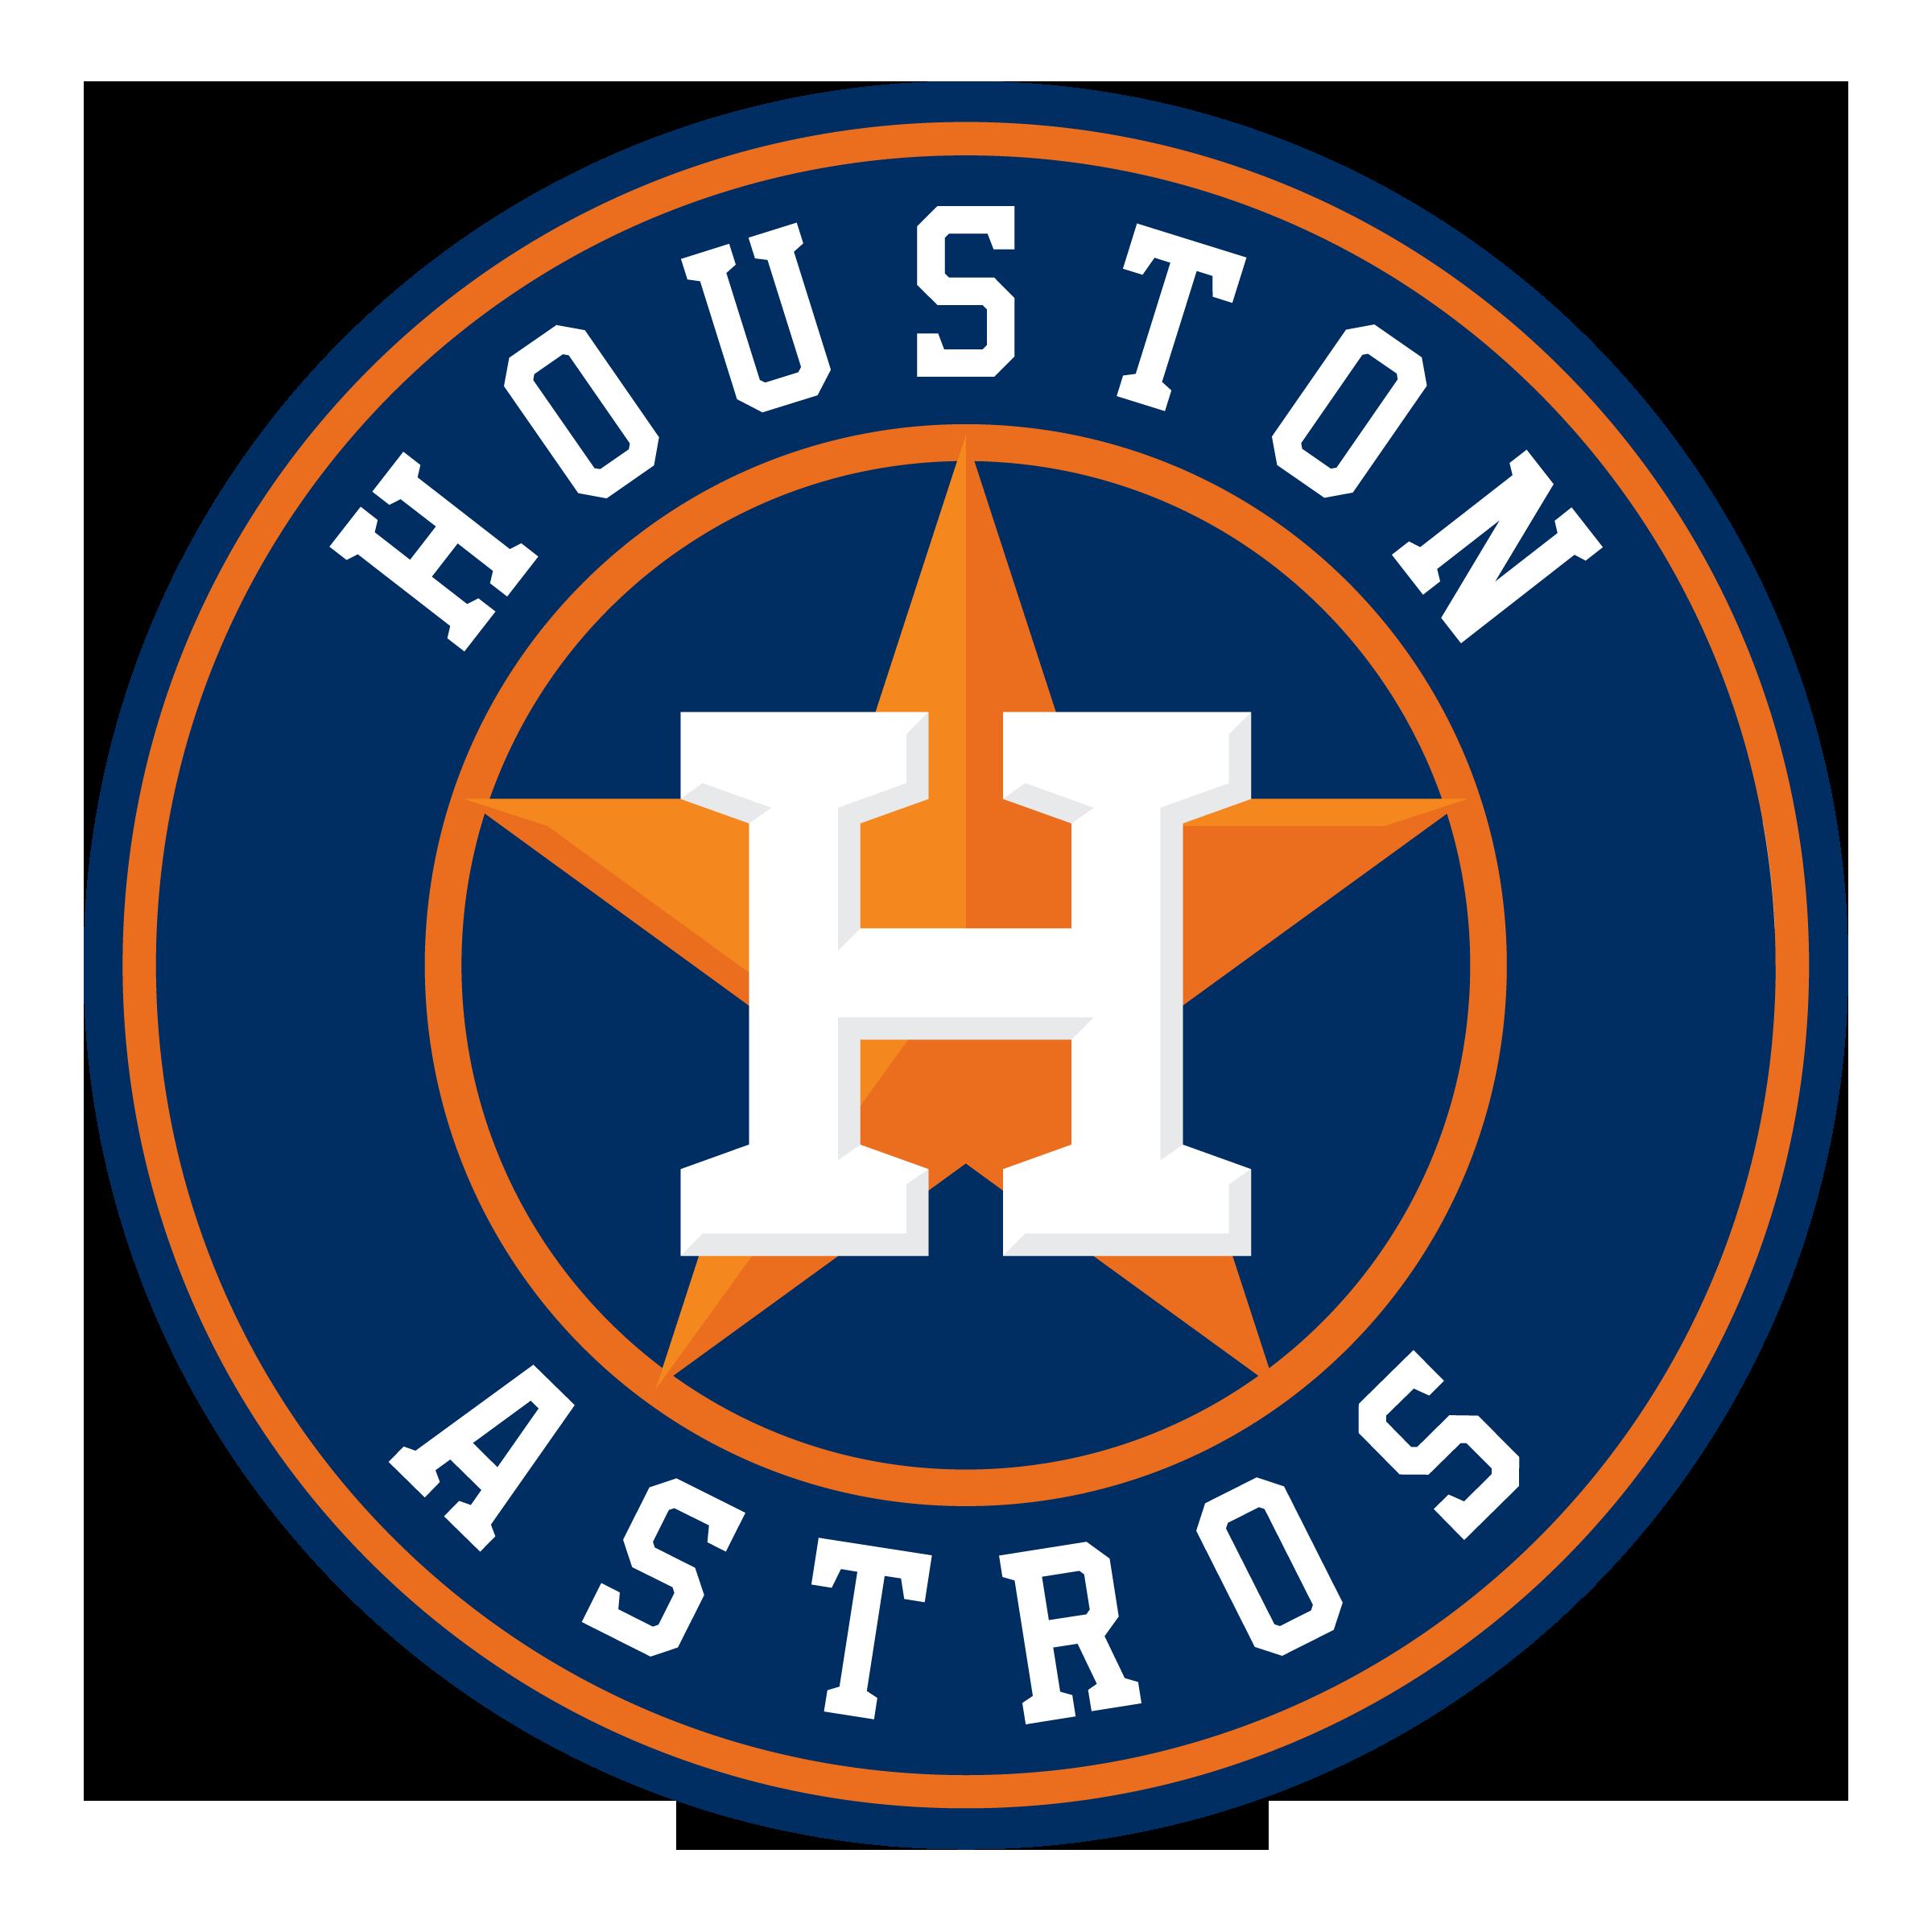 Houston Astros - 5.21% growth rate - facebook(vs. 1.0% via league average)